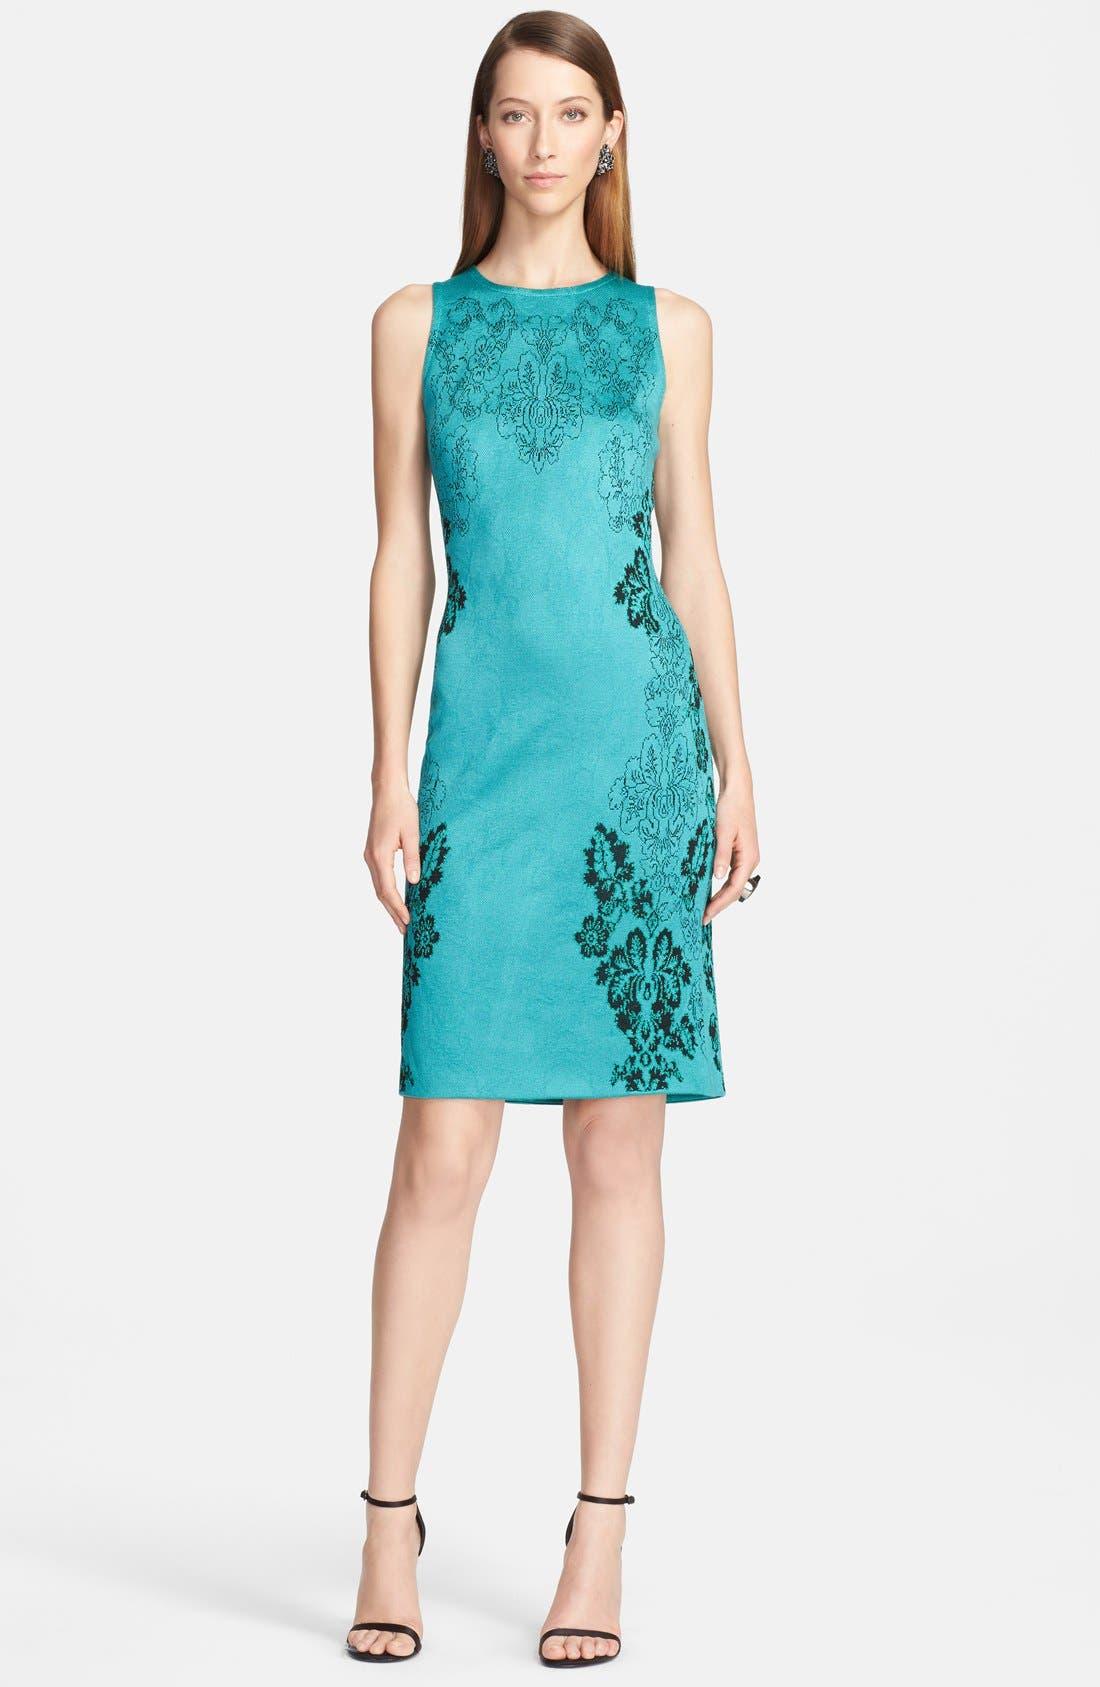 Alternate Image 1 Selected - St. John Collection 'Floral Cascade' Jacquard Knit Sheath Dress